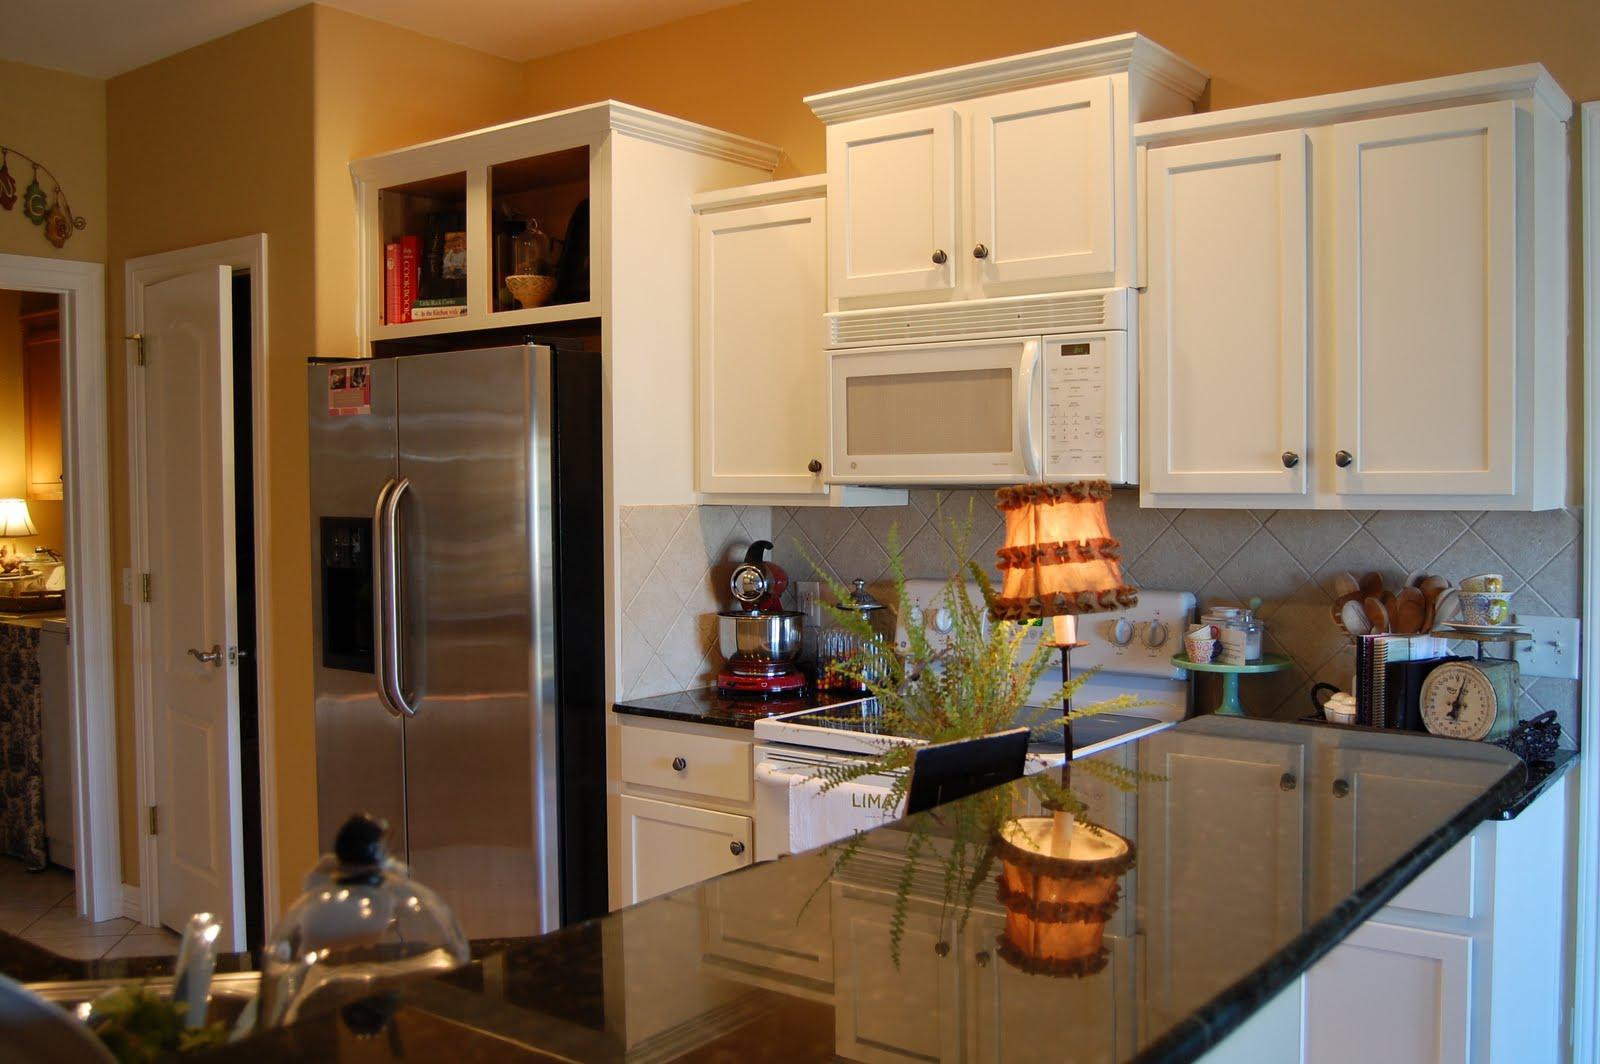 Kitchen Cabiabove Fridge